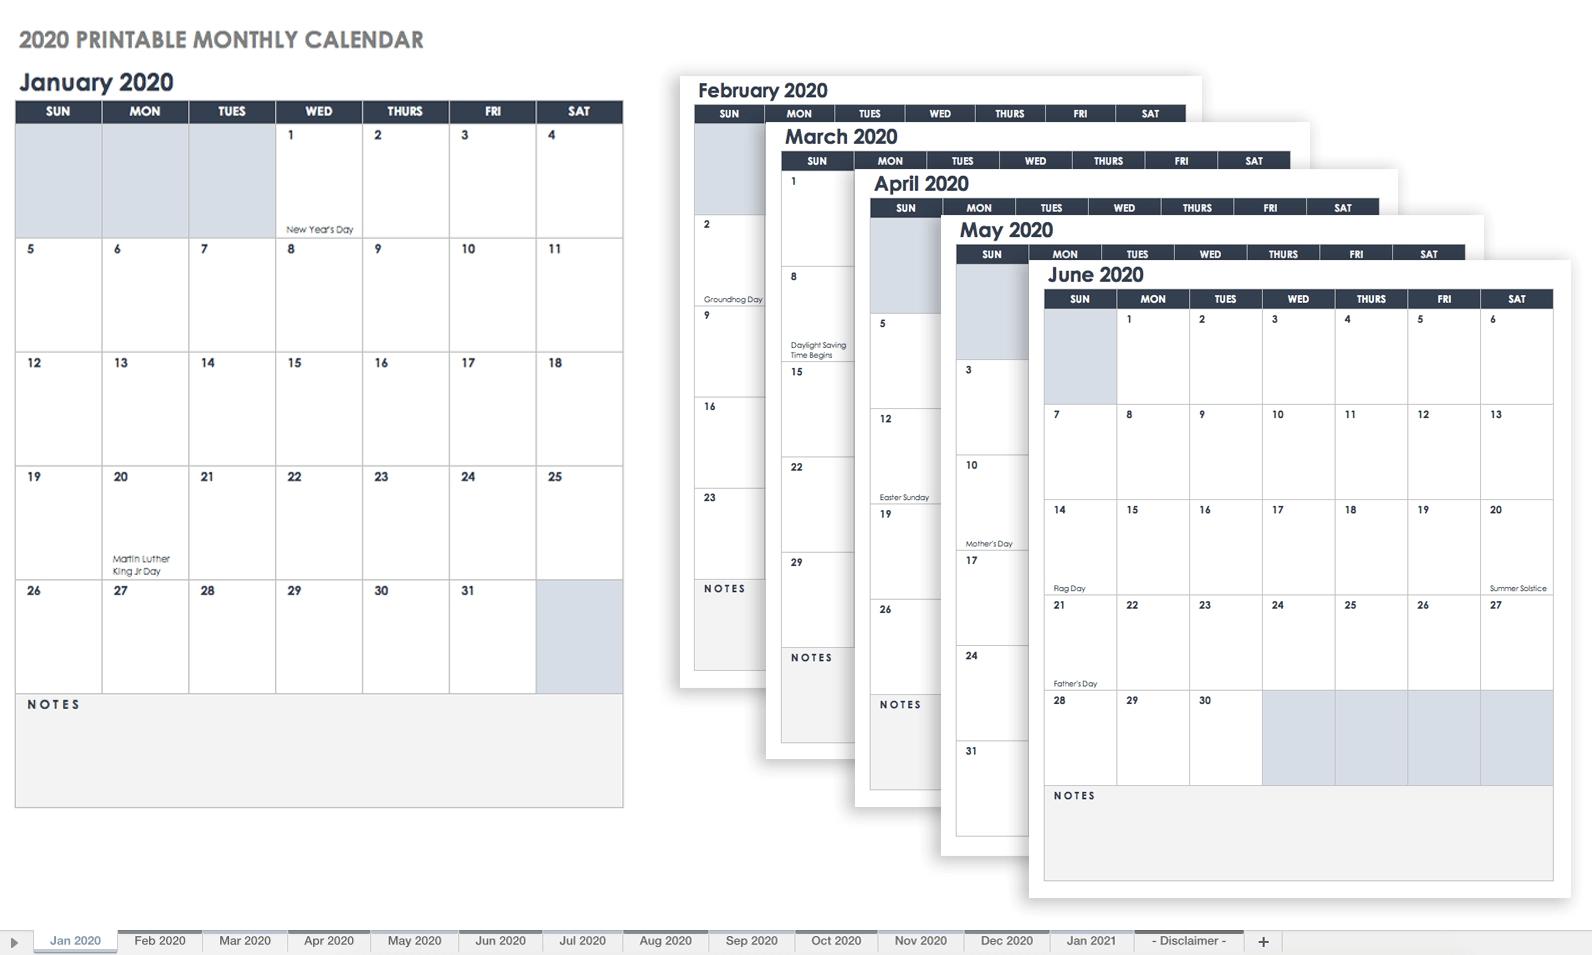 Free, Printable Excel Calendar Templates For 2019 & On | Smartsheet inside Calendar 2020 Large Box